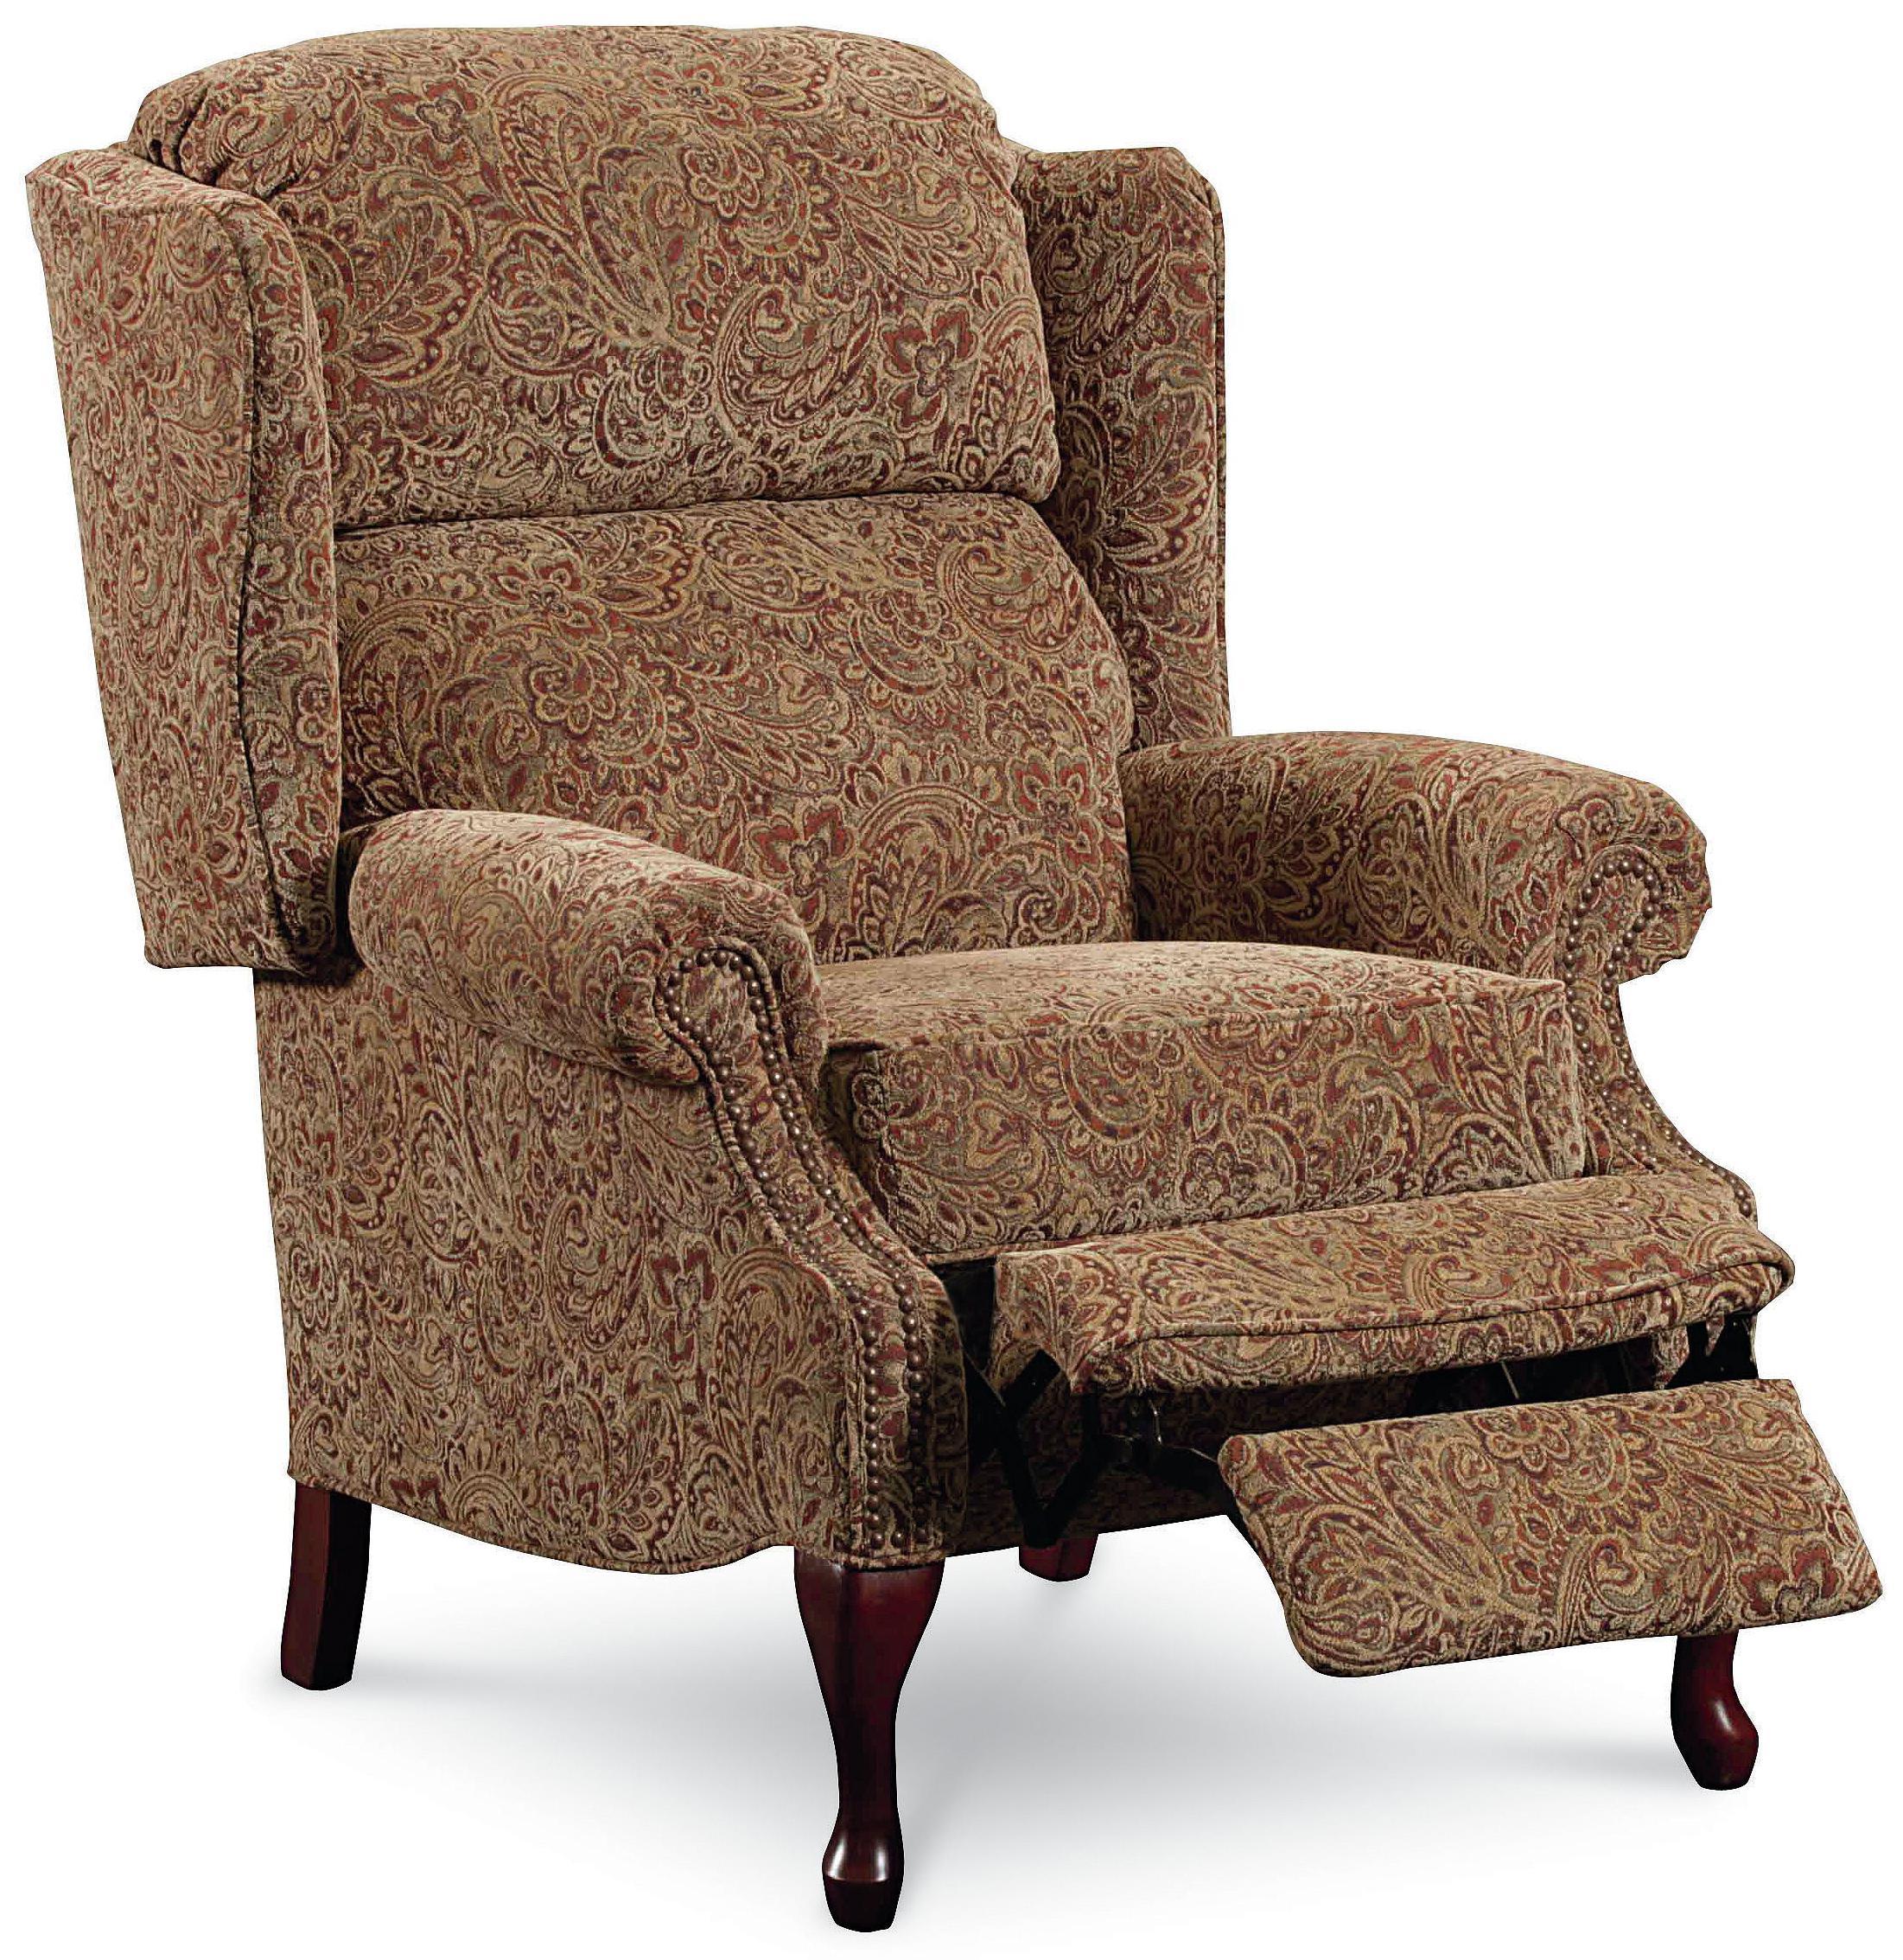 wing back chair recliner dining chairs on wheels lane hi leg recliners 2530 savannah high